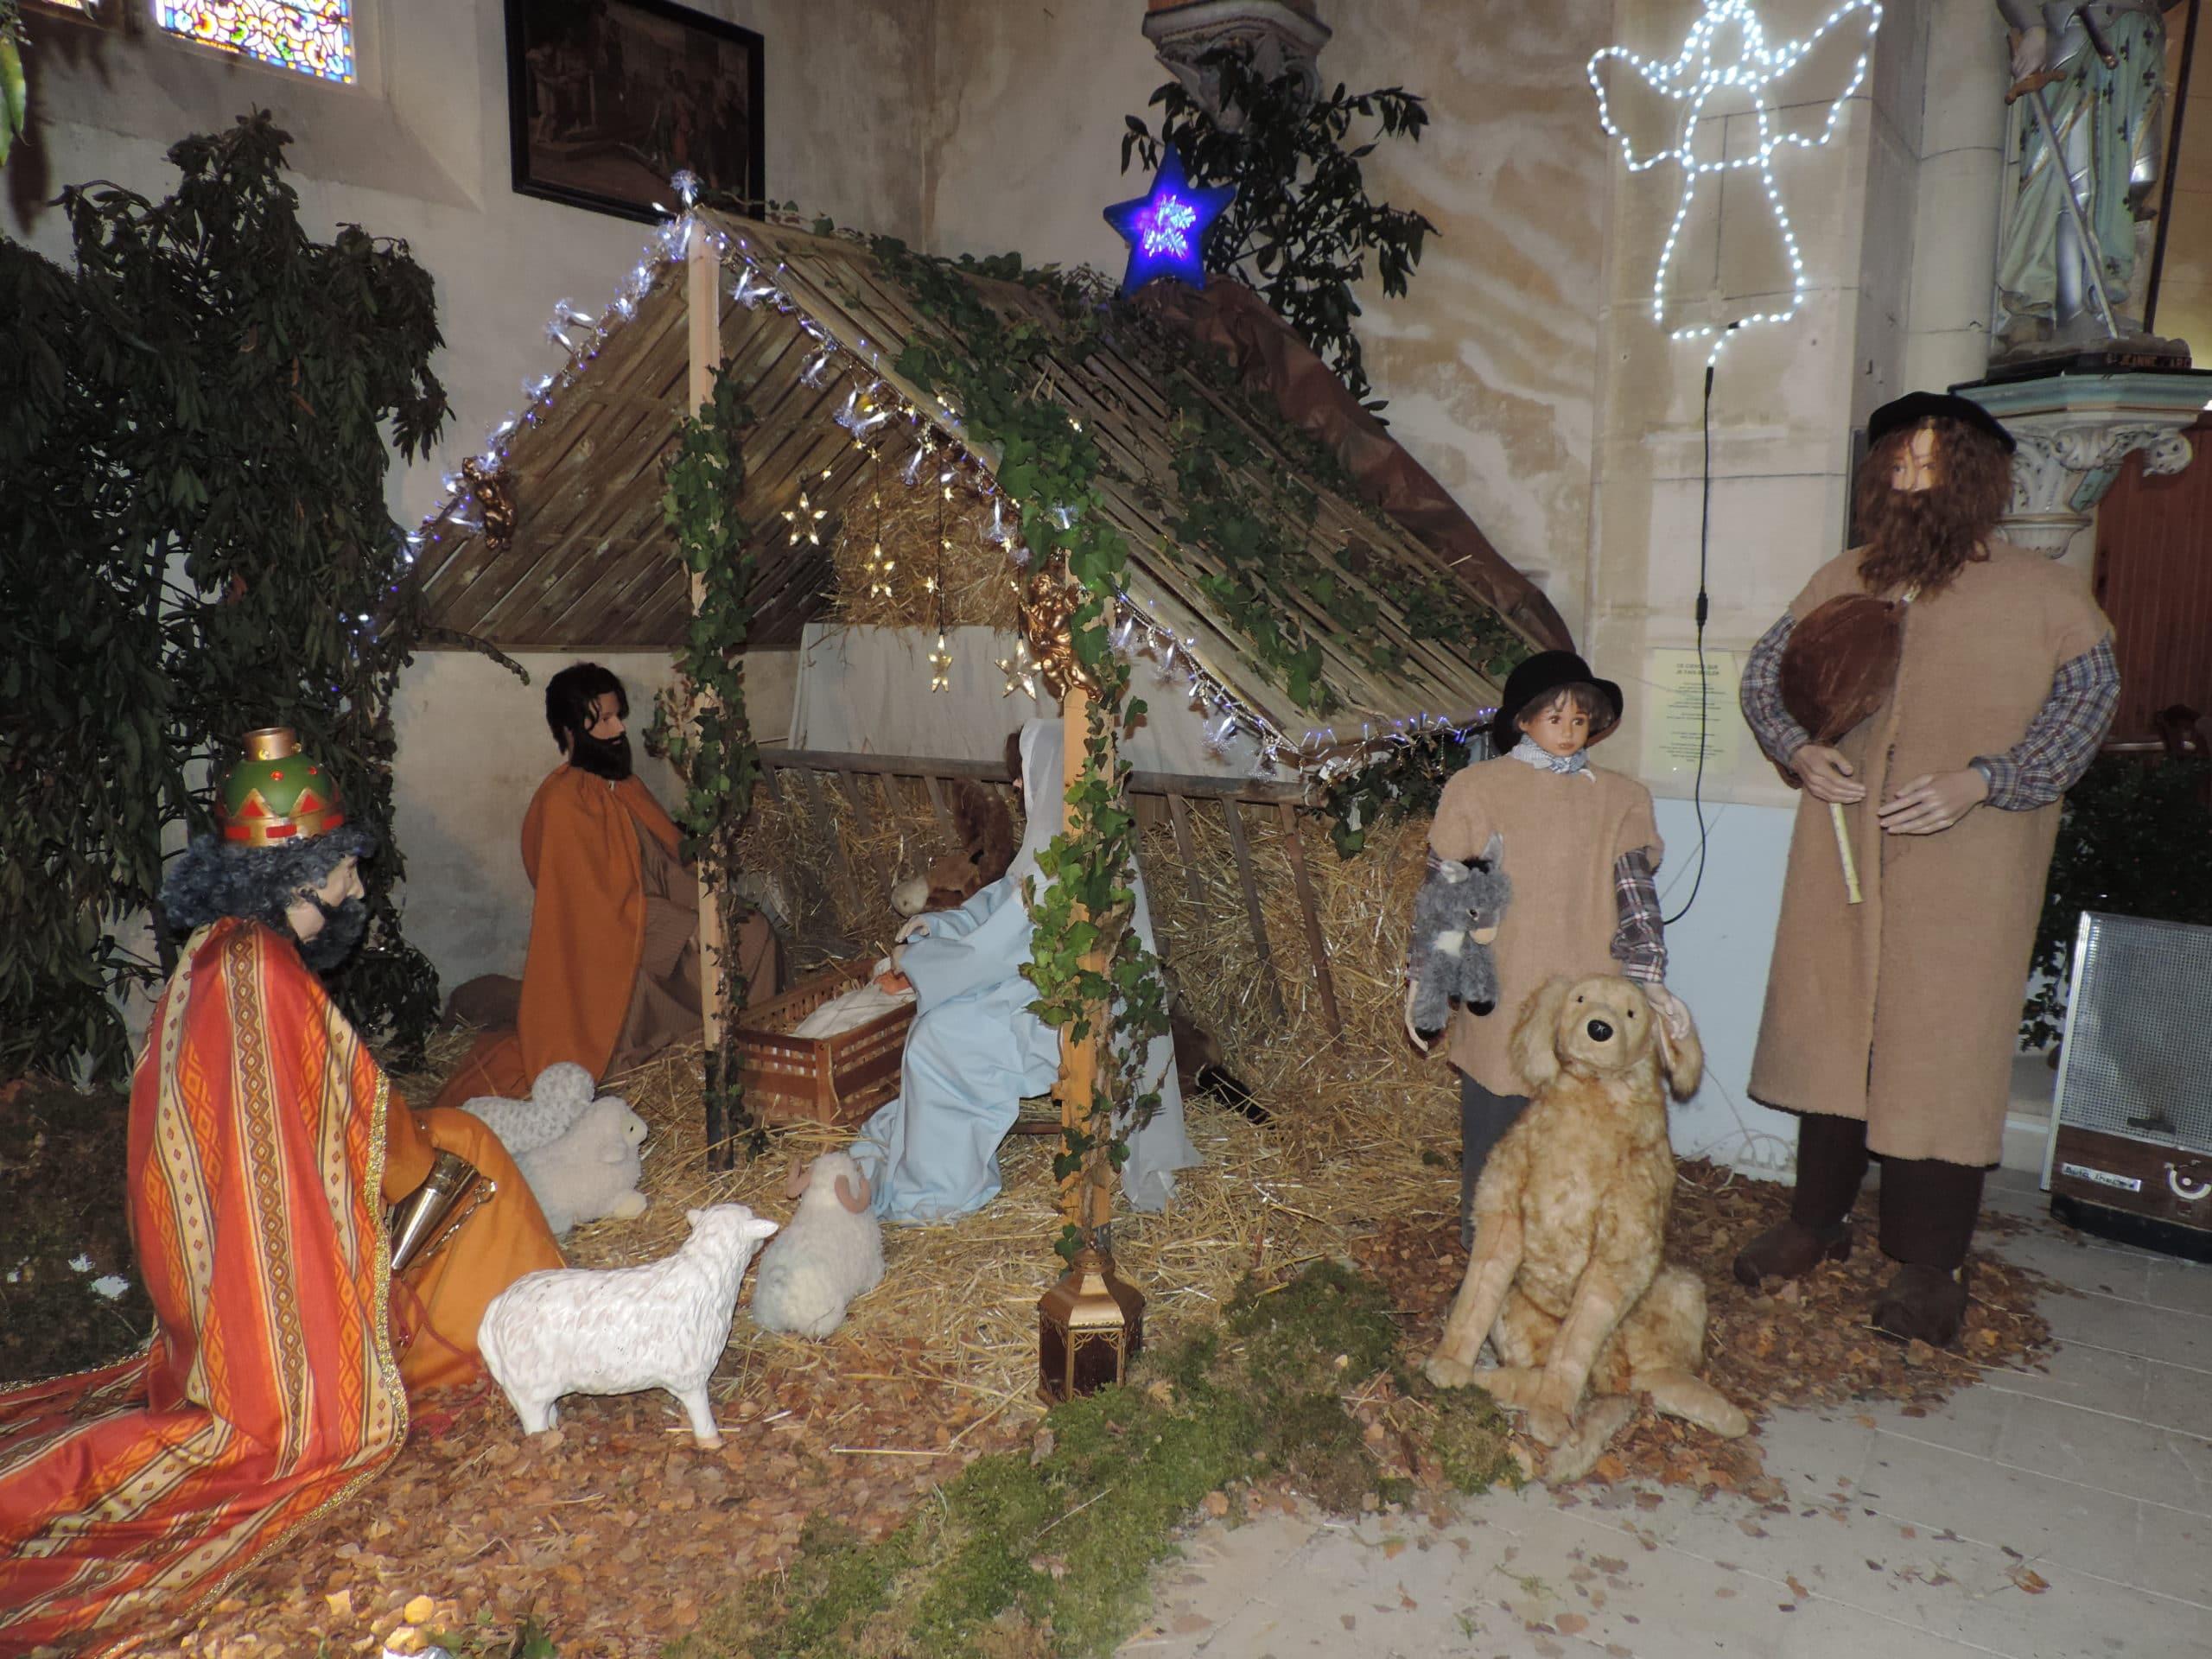 Le Riverain - L'origine de Noël